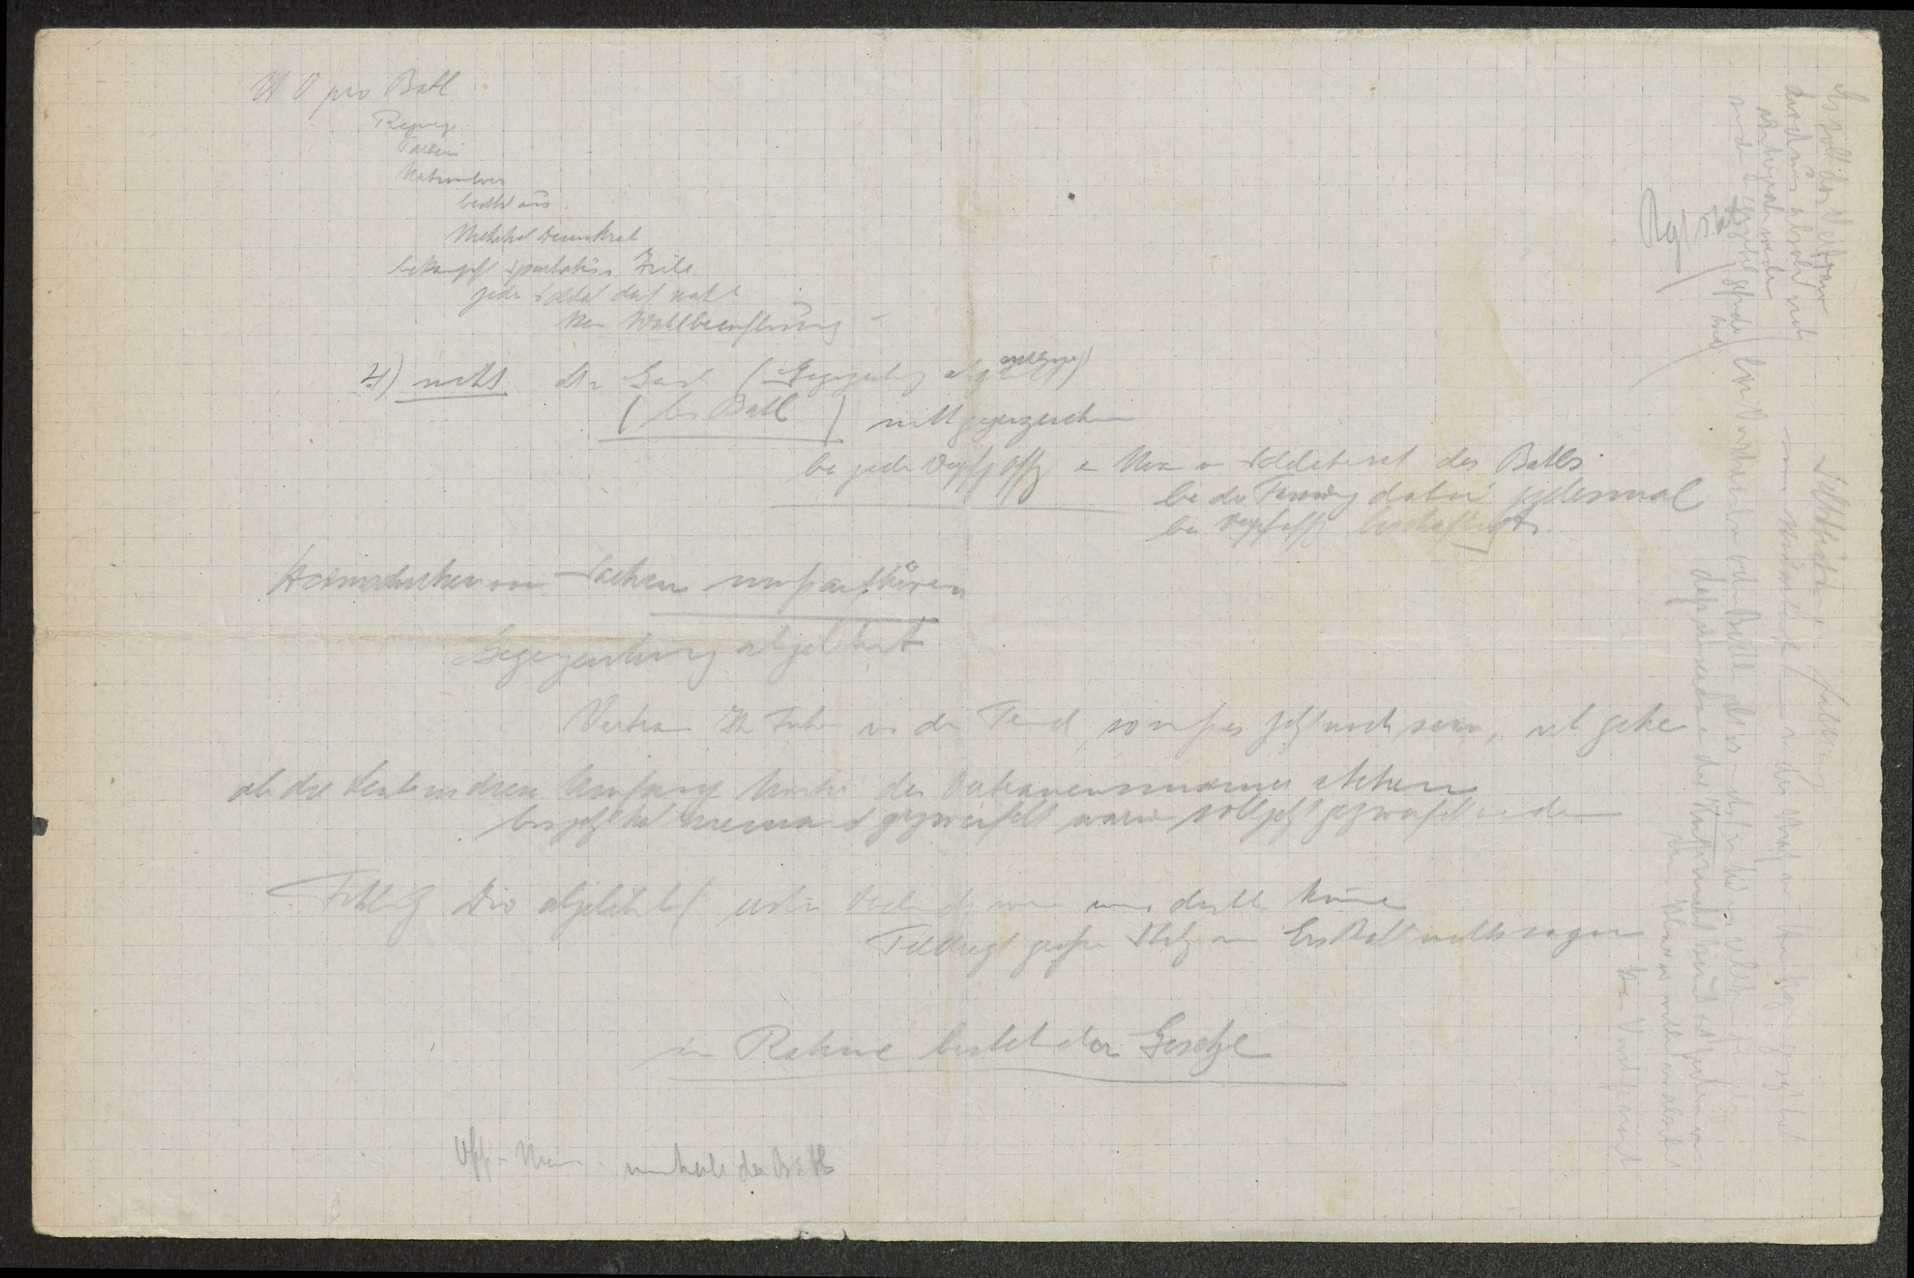 Sitzungsprotokolle des Soldatenrats des (Feld-)Gebirgsregiments, Bild 3